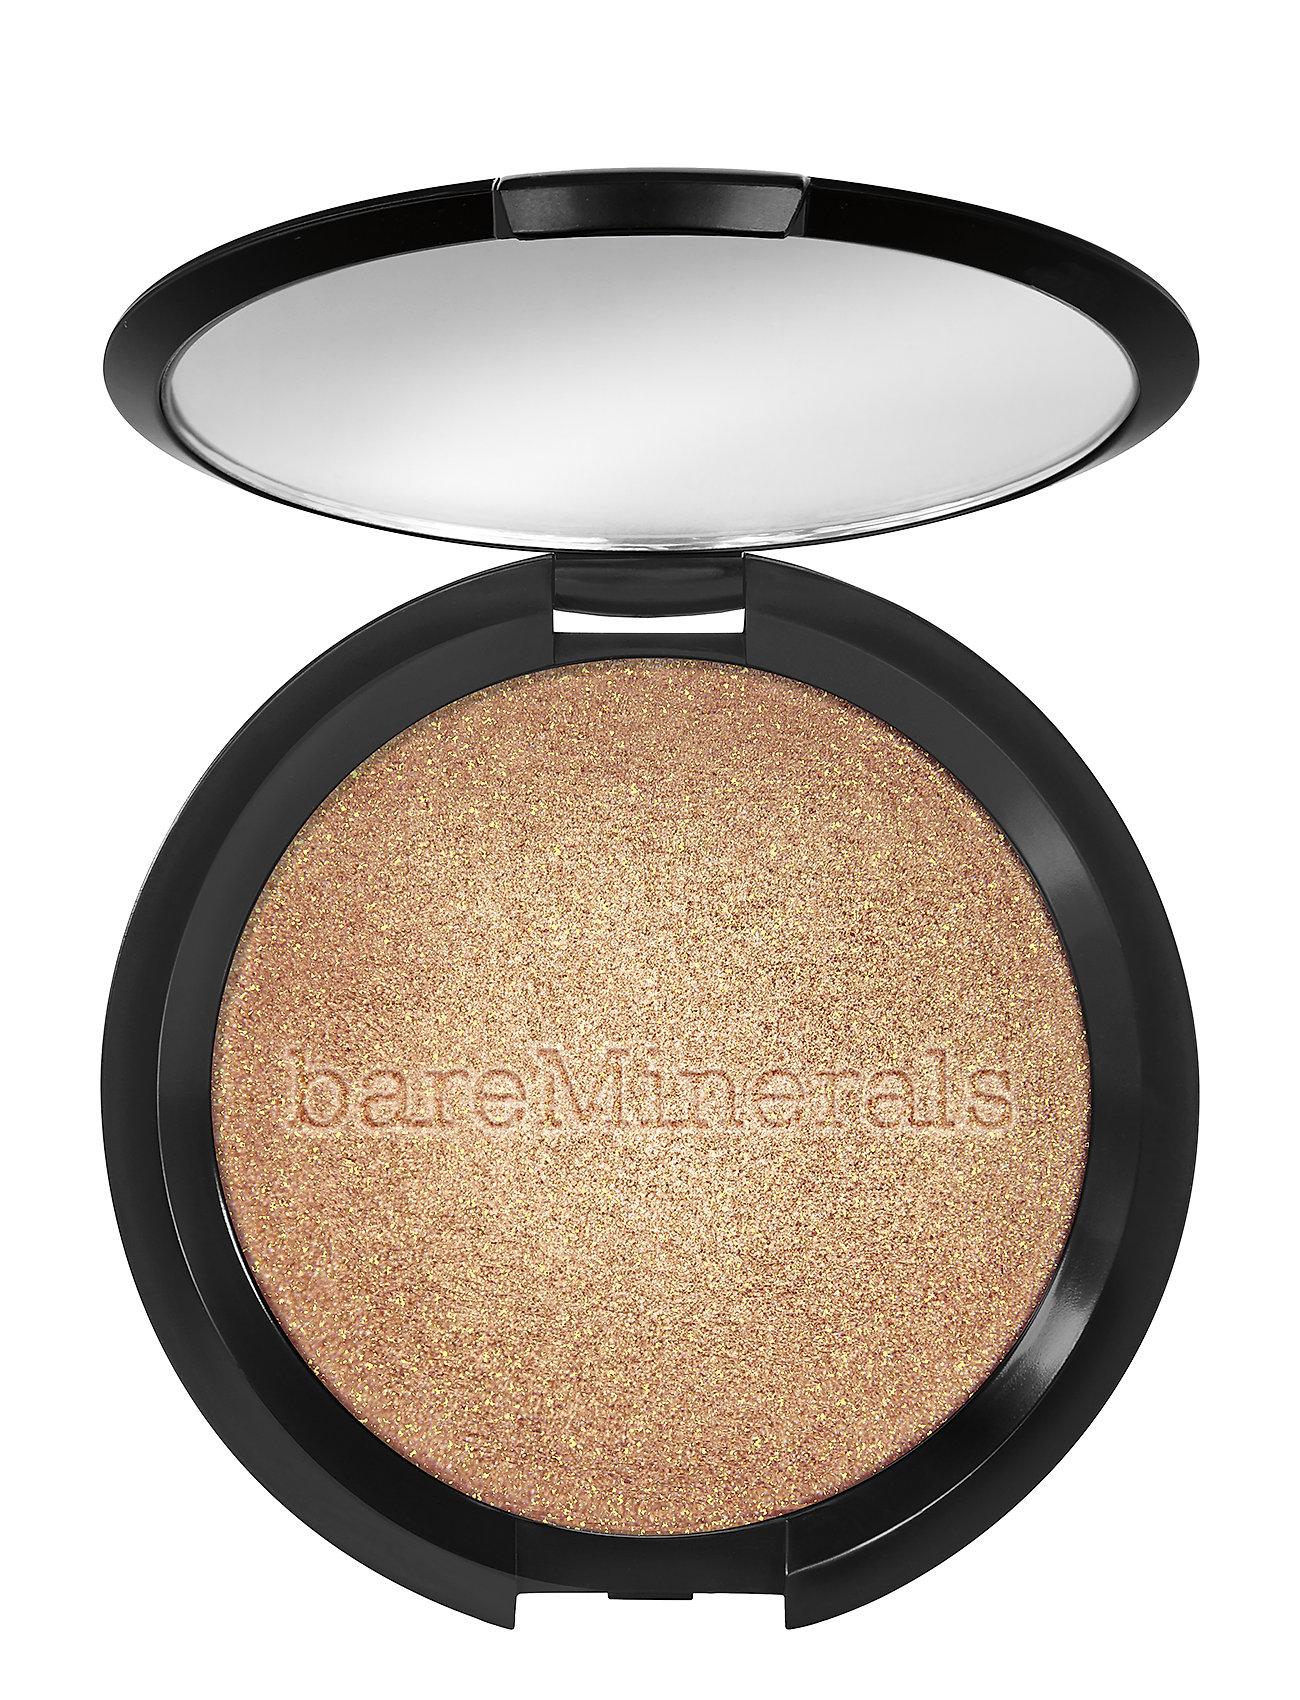 Image of Endless Glow Highlighter Fierce Highlighter Contour Makeup Multi/mønstret BareMinerals (3210823291)